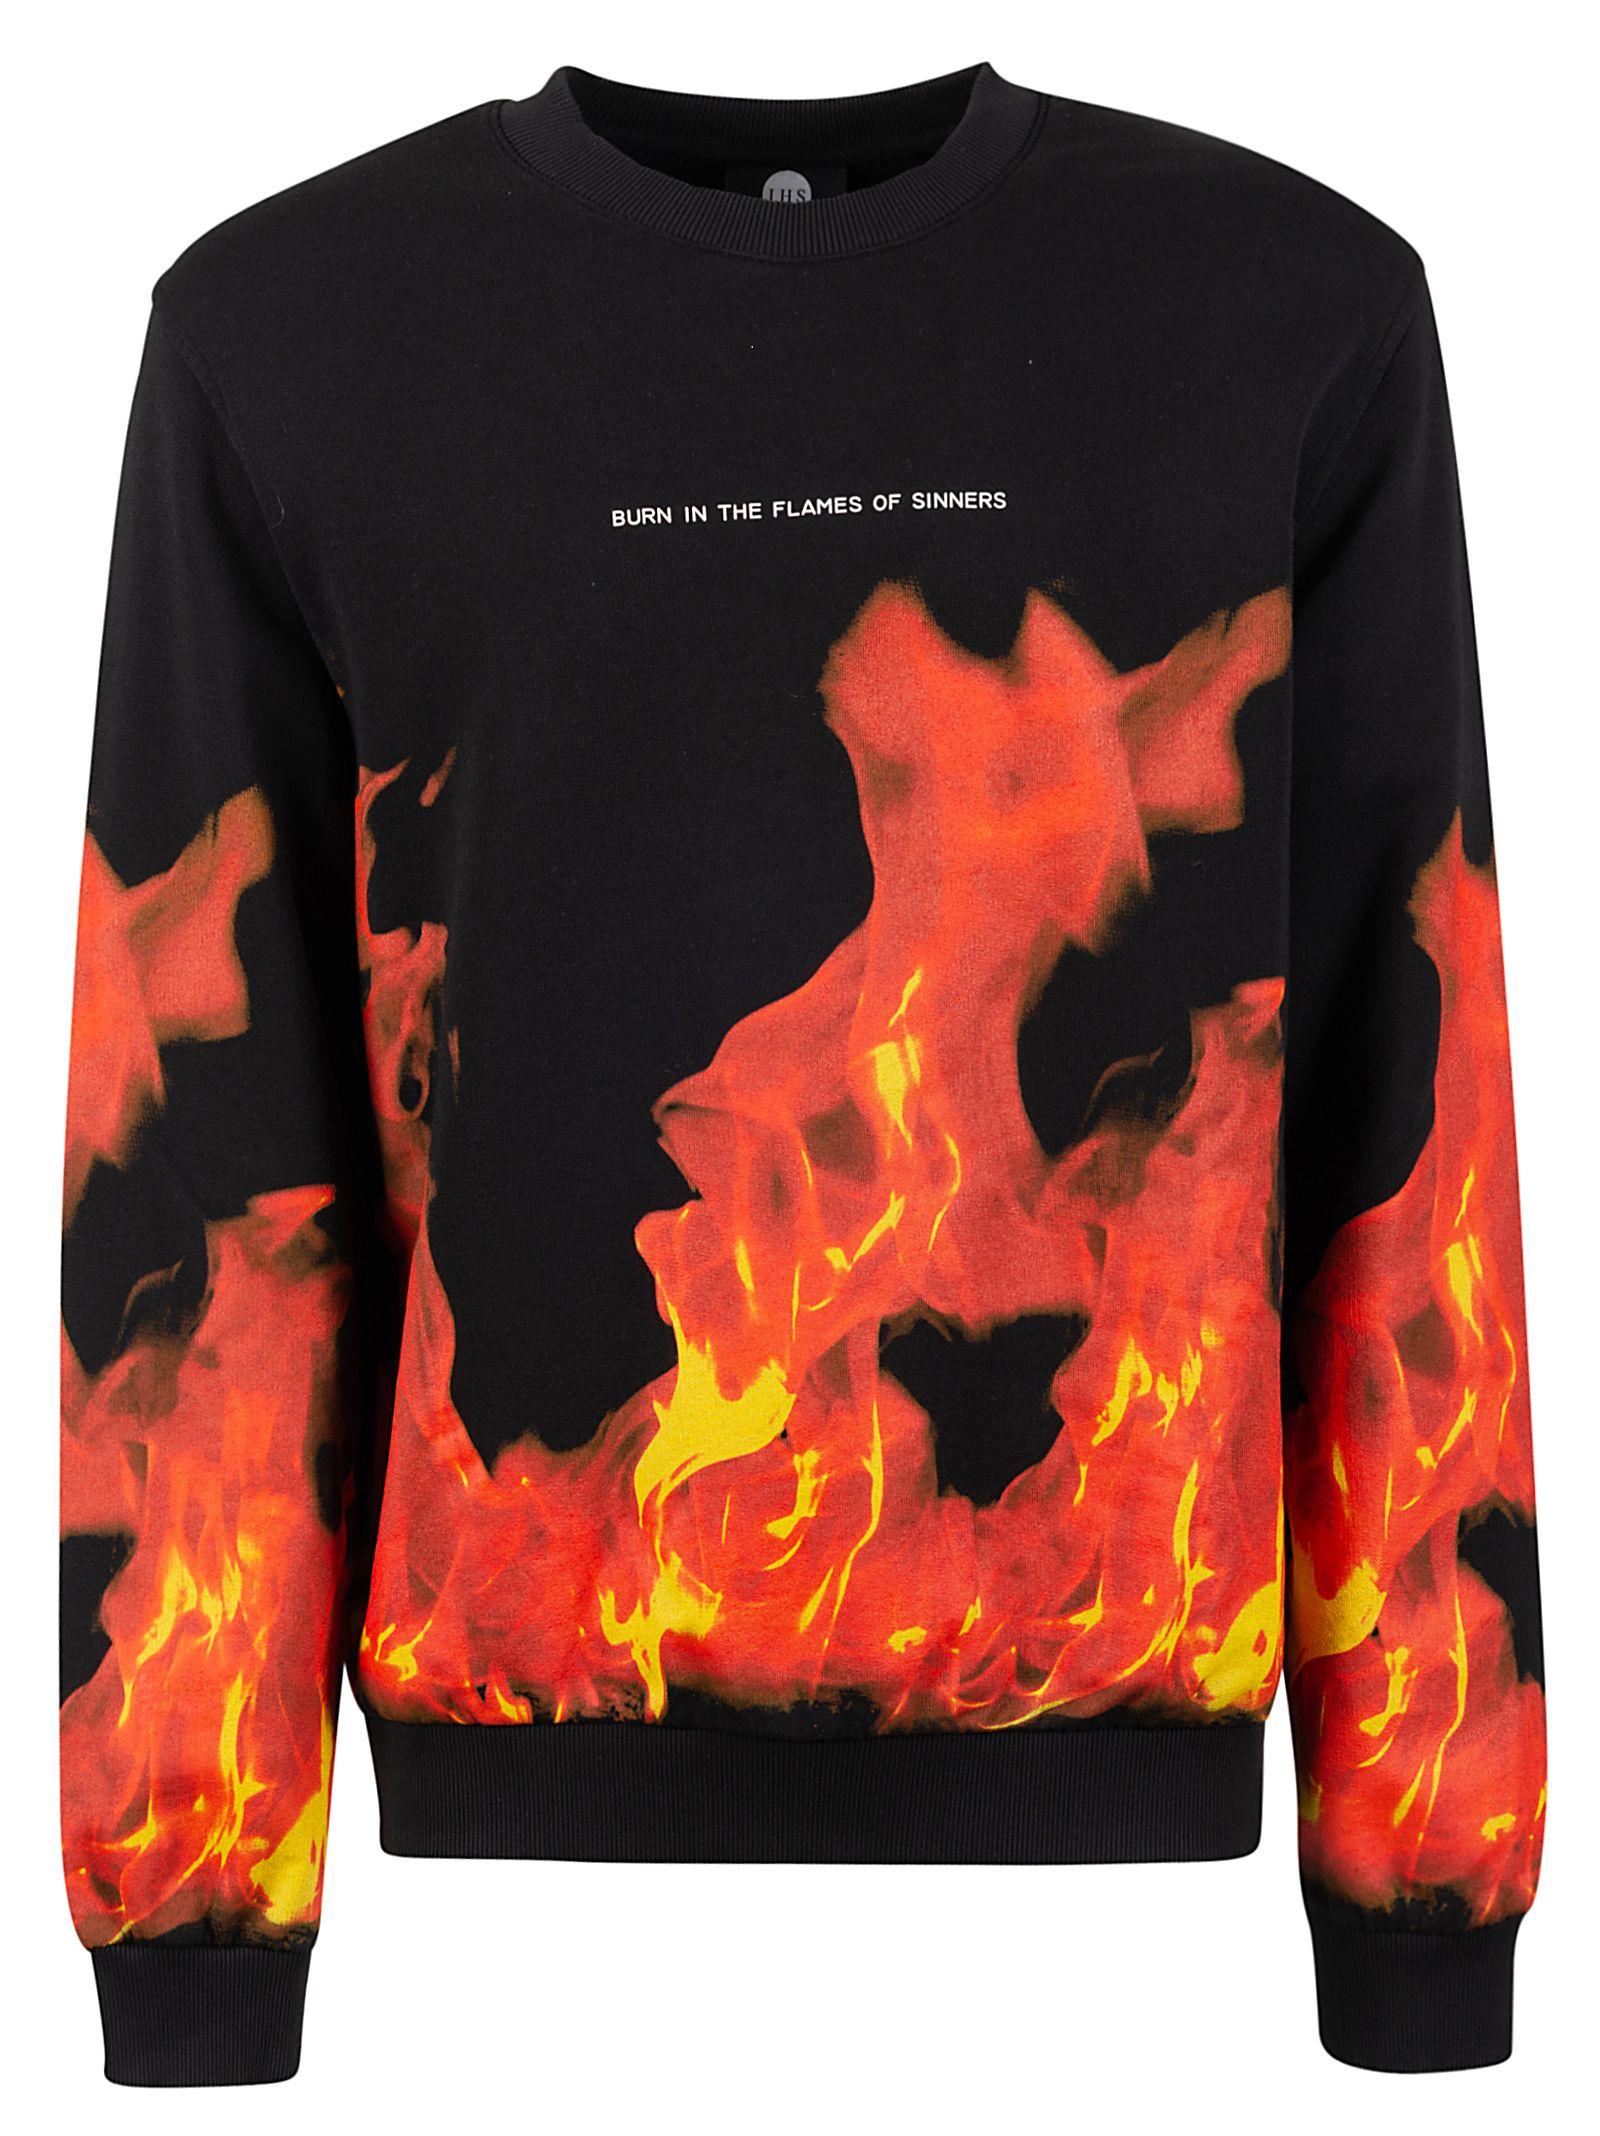 Ihs Black Cotton Sweatshirt